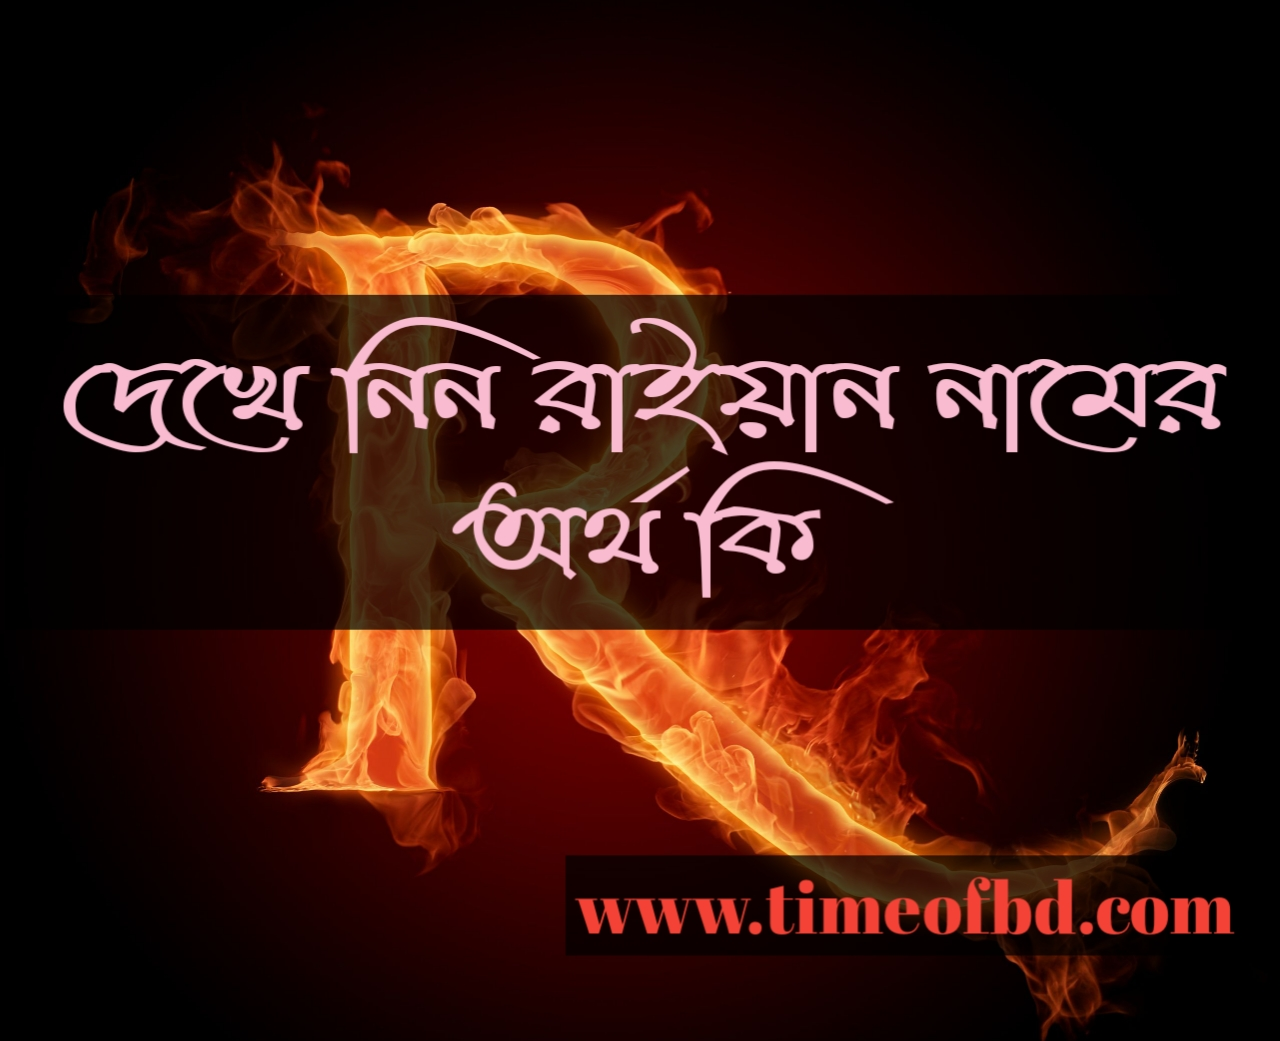 raiyan name meaning in Bengali, রাইয়ান নামের অর্থ কি, রাইয়ান নামের বাংলা অর্থ কি, রাইয়ান নামের ইসলামিক অর্থ কি,